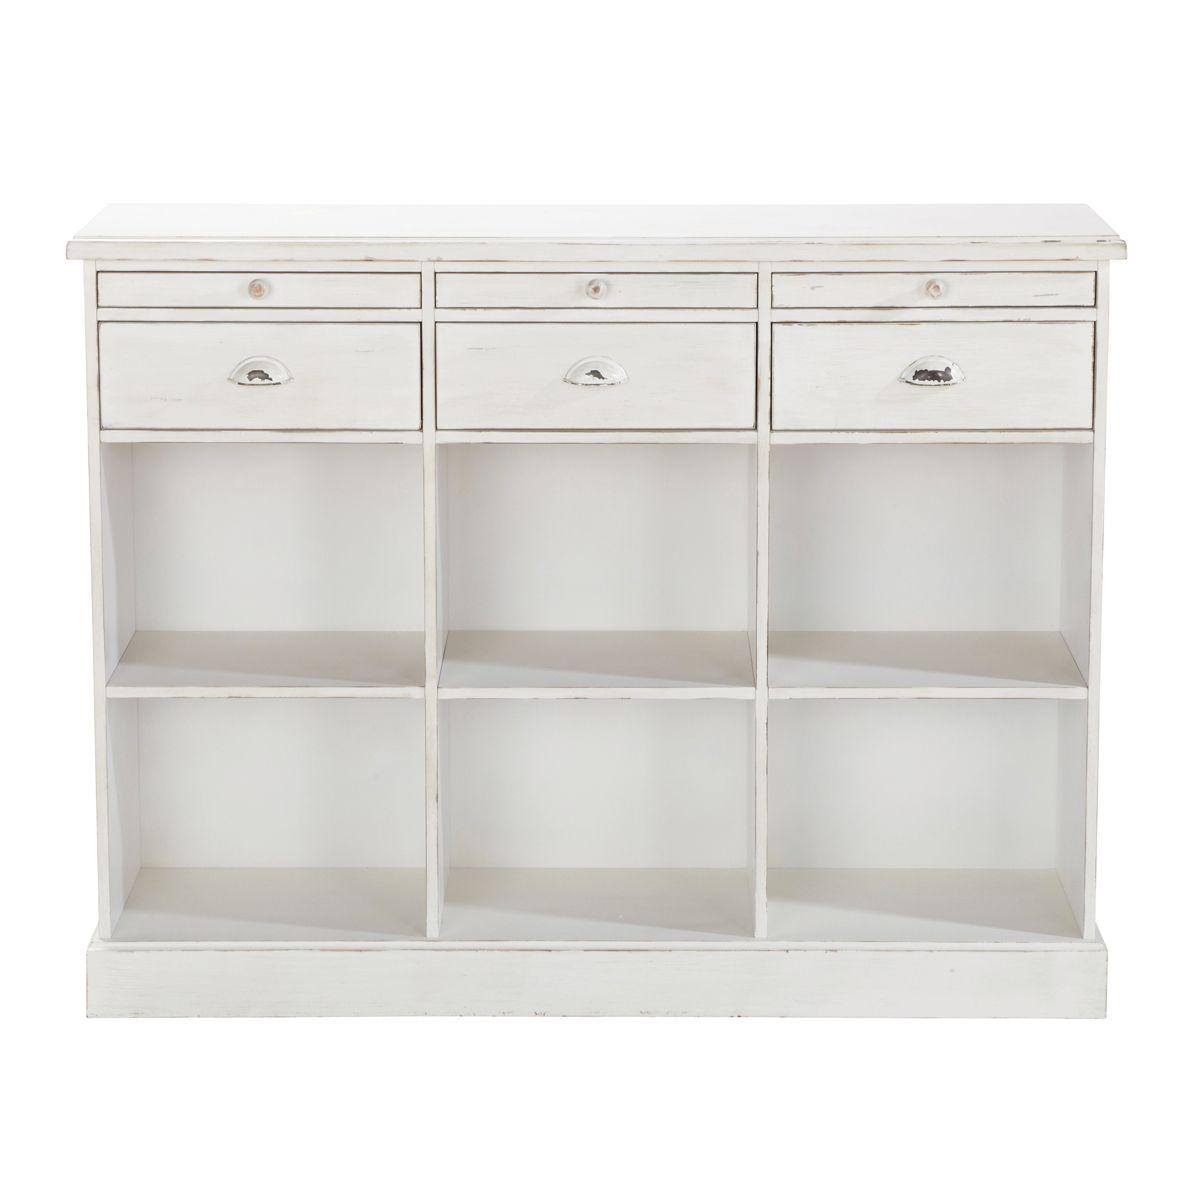 Cajonera consola mueble de oficio blanco marfil GARANCE | Home sweet ...